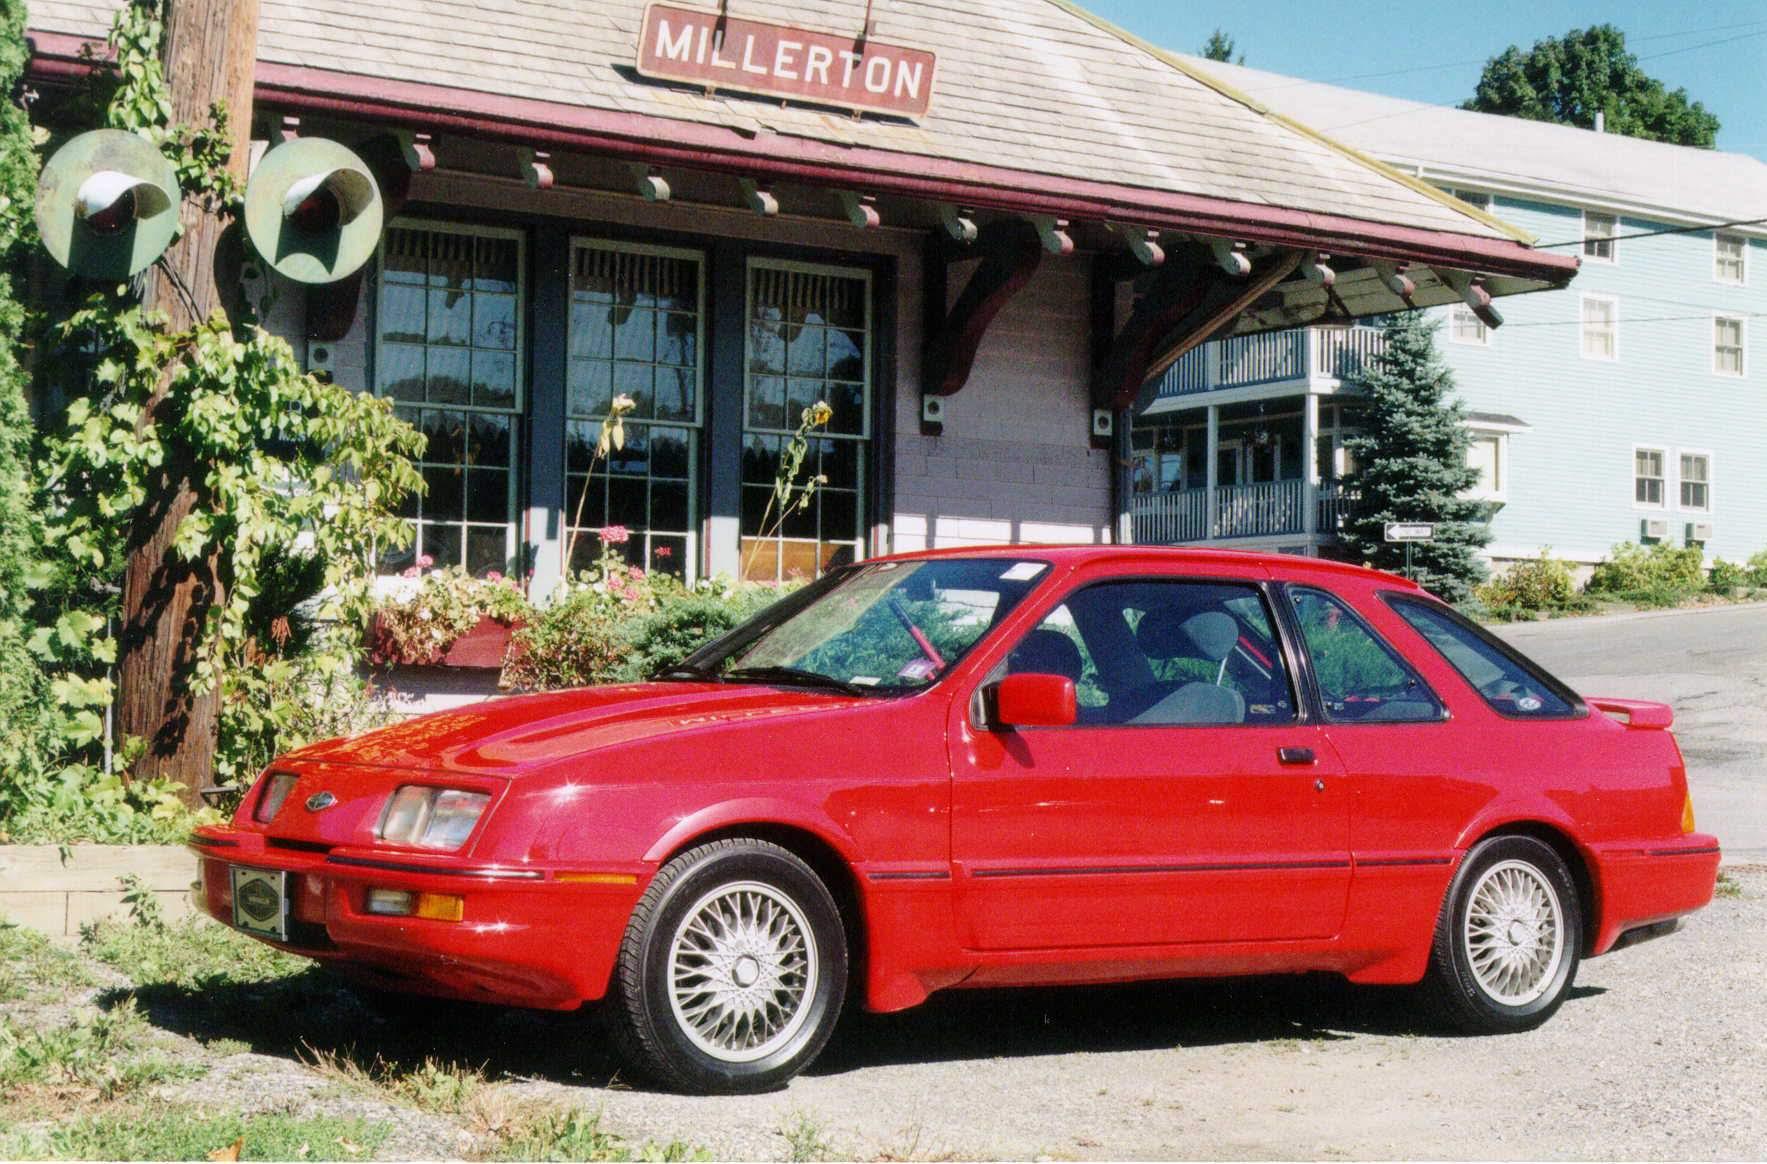 Paul West's 1989 Merkur XR4Ti